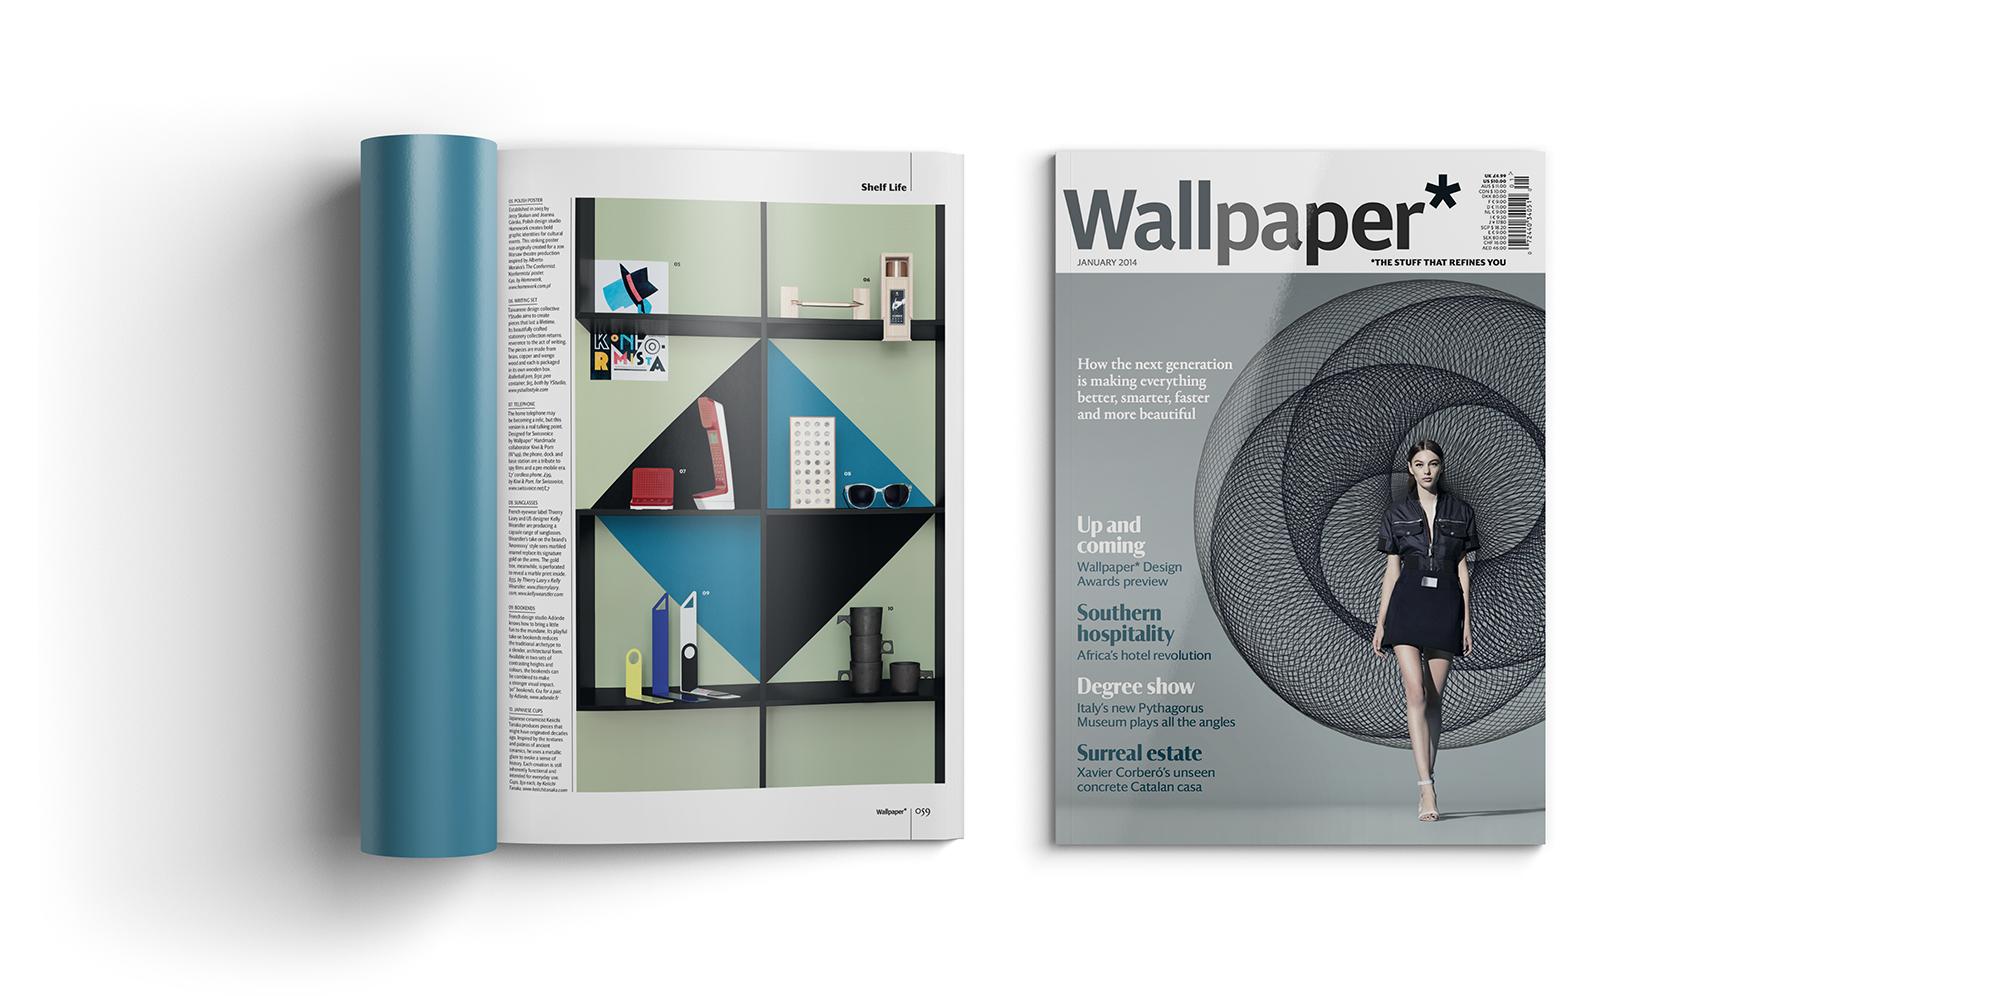 wallpaper magazine.png